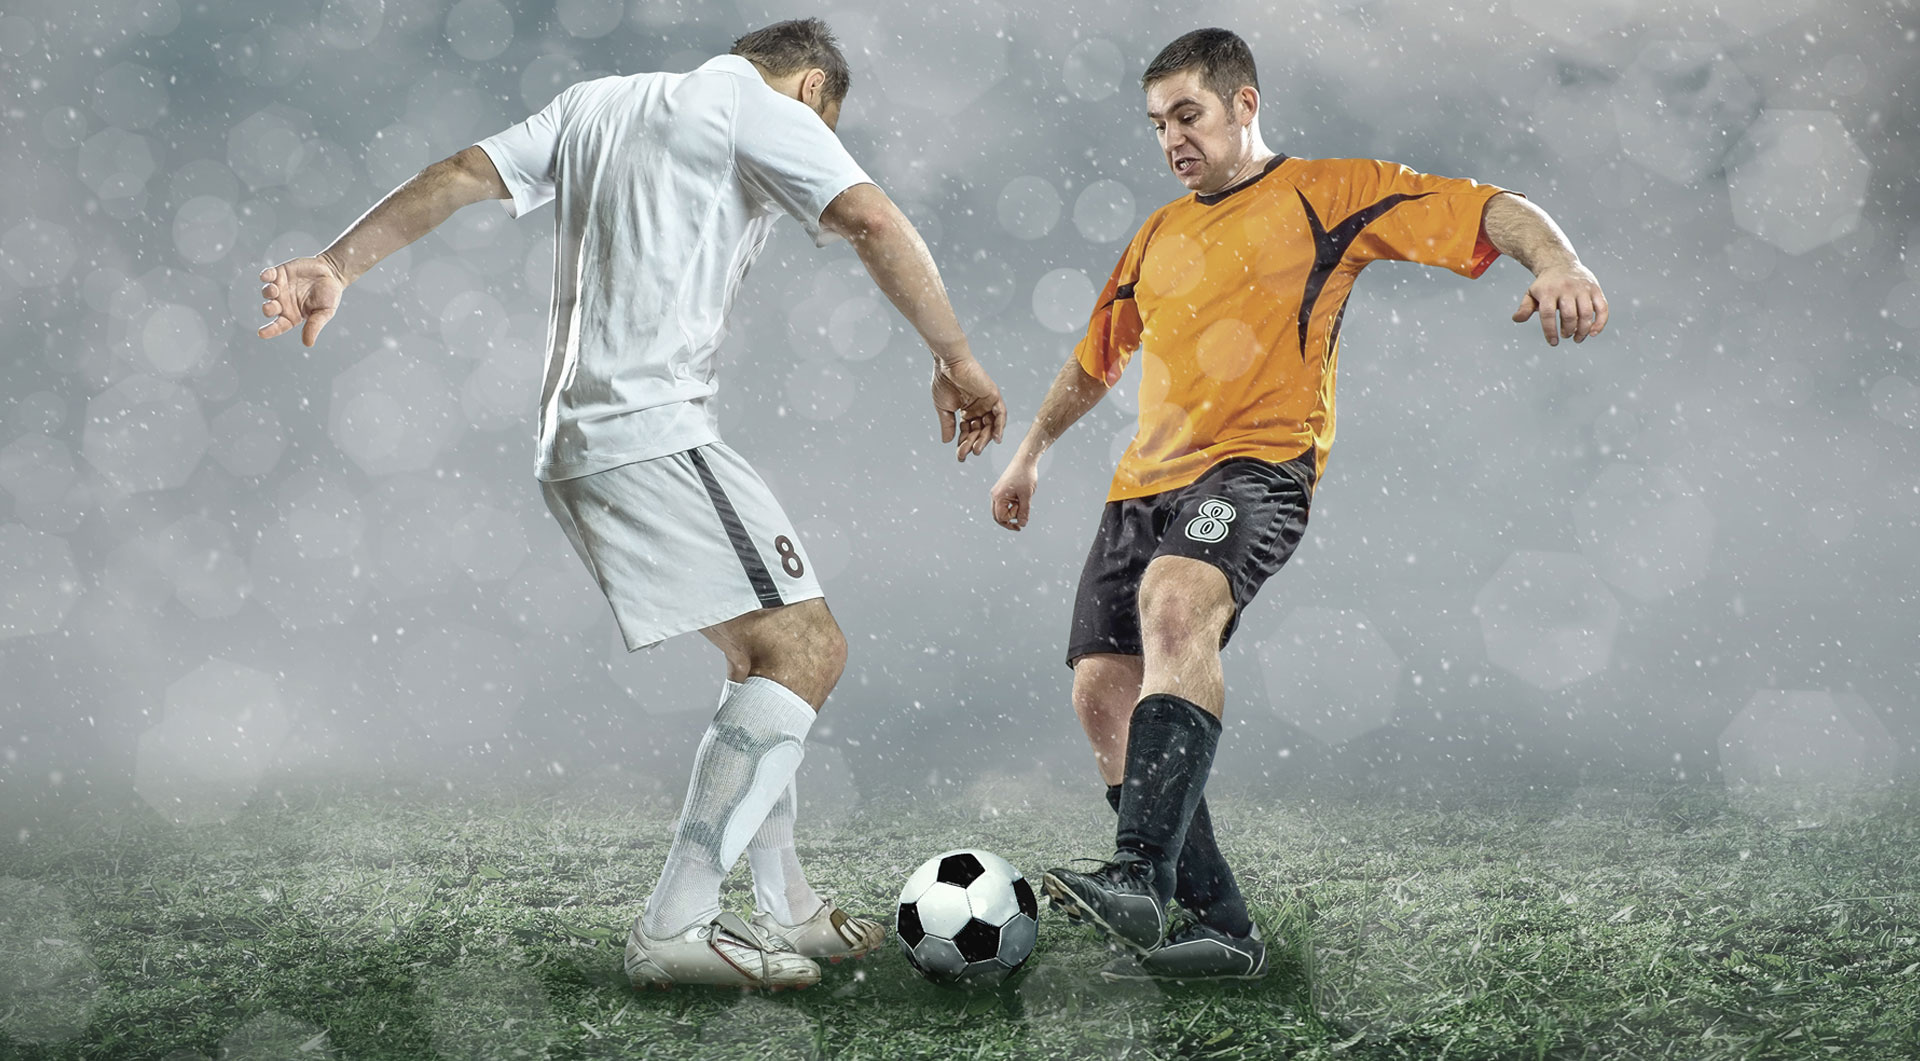 watch-c.-suarez-navarro-vs-s.-williams-online